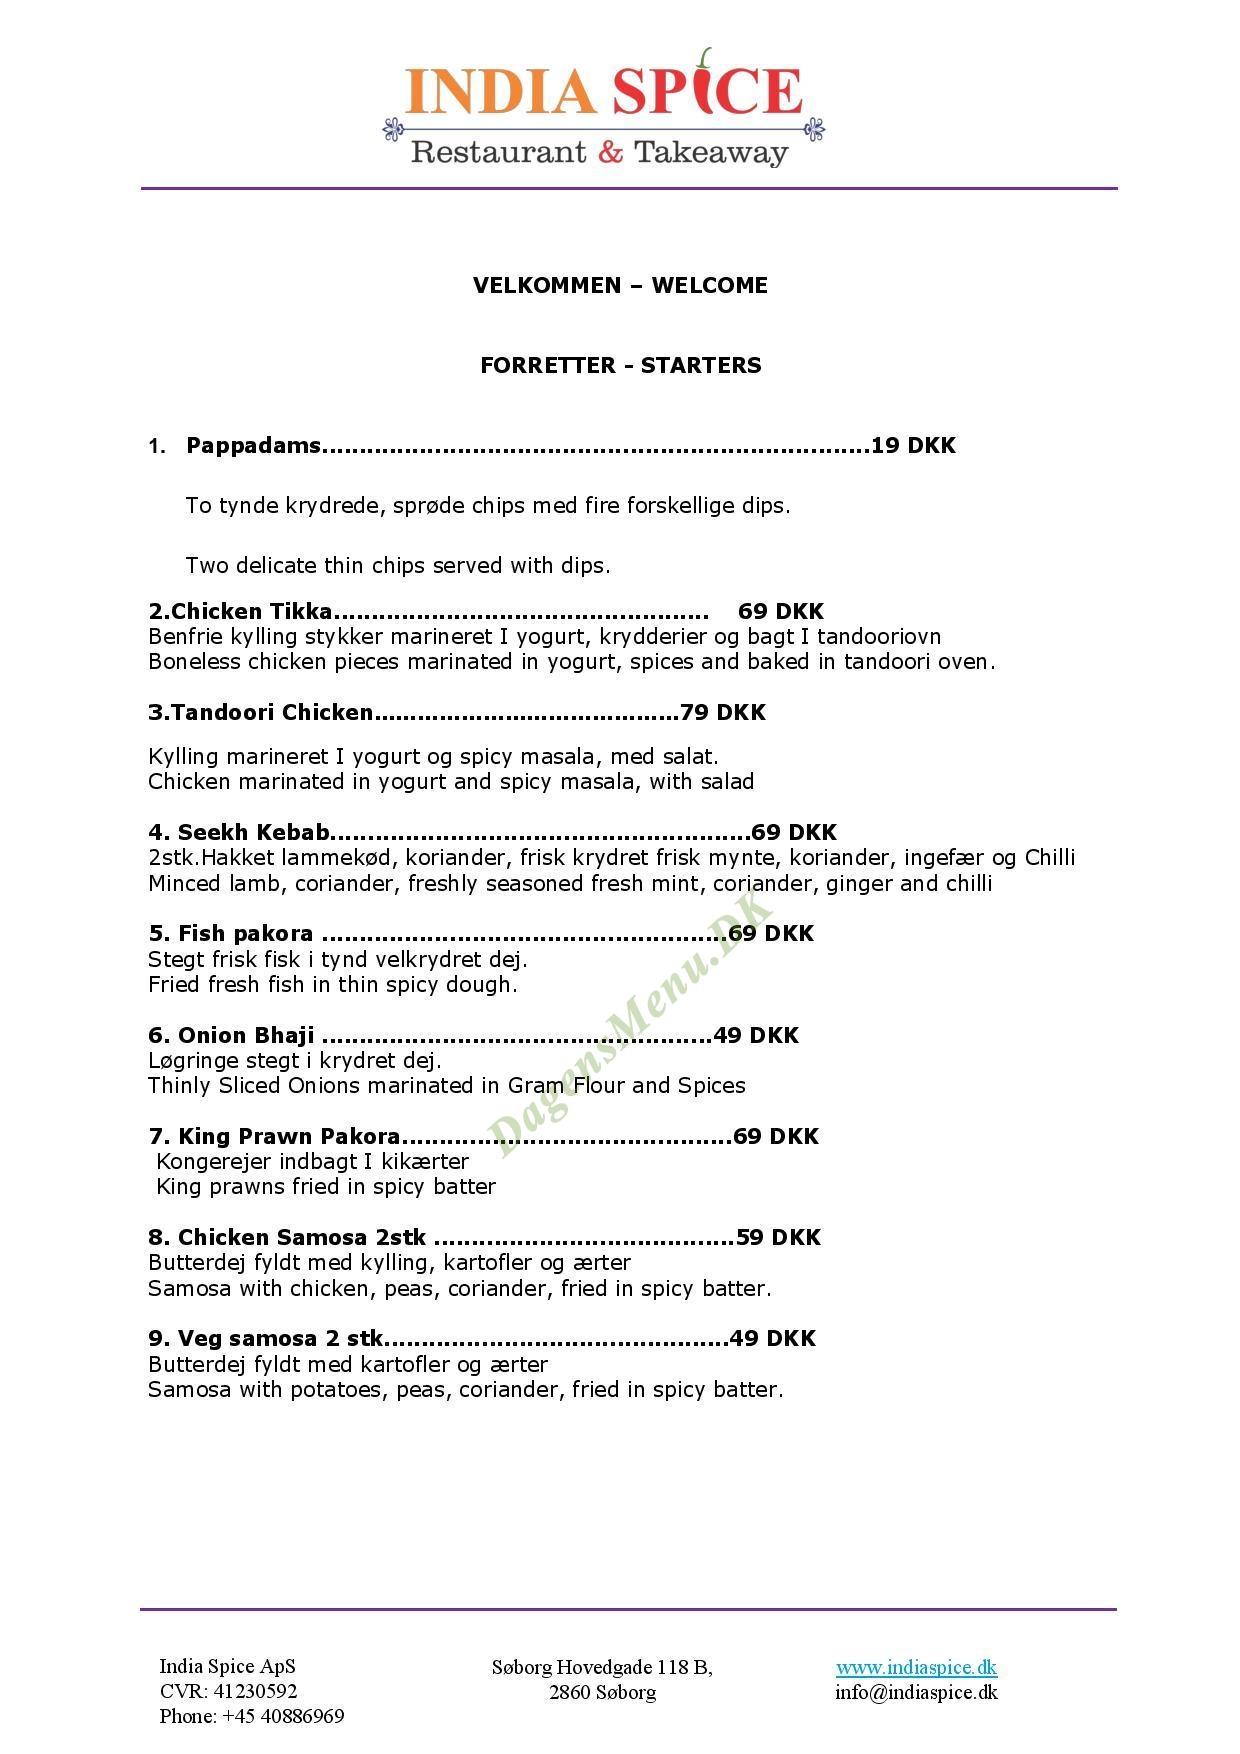 India Spice indisk restaurant - Menukort